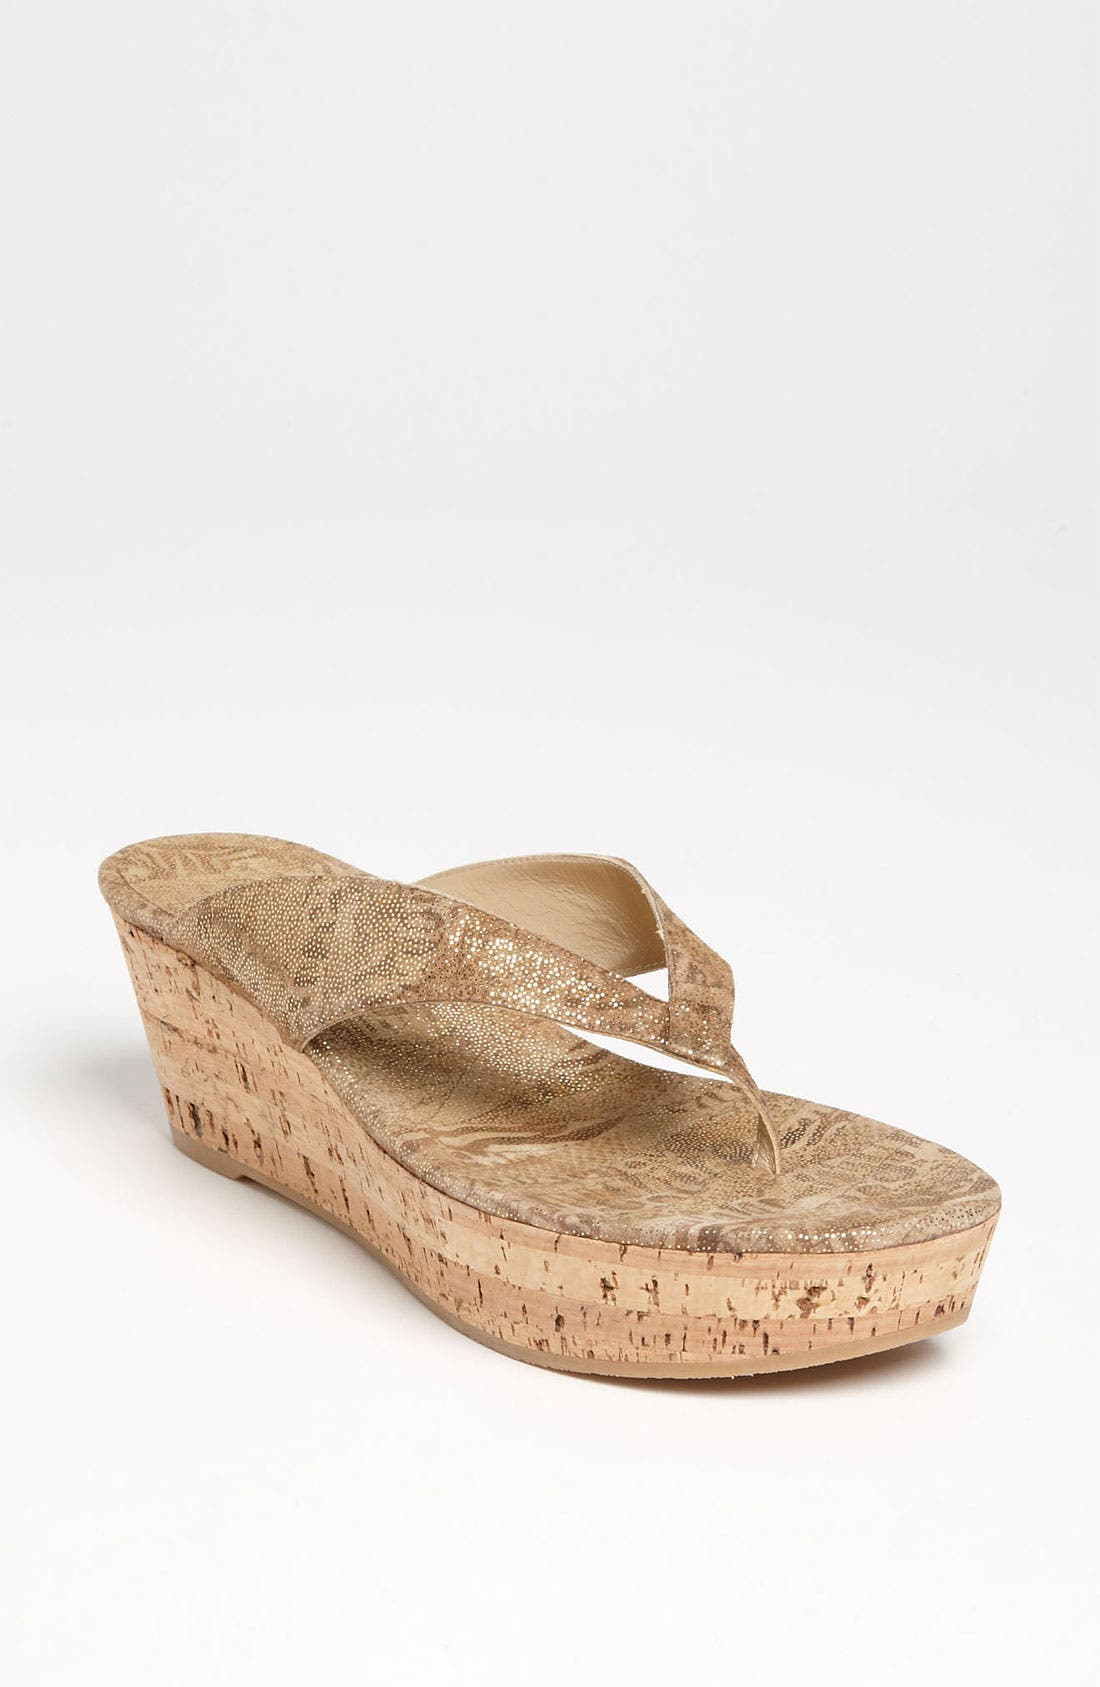 Main Image - Stuart Weitzman 'Clasp' Sandal